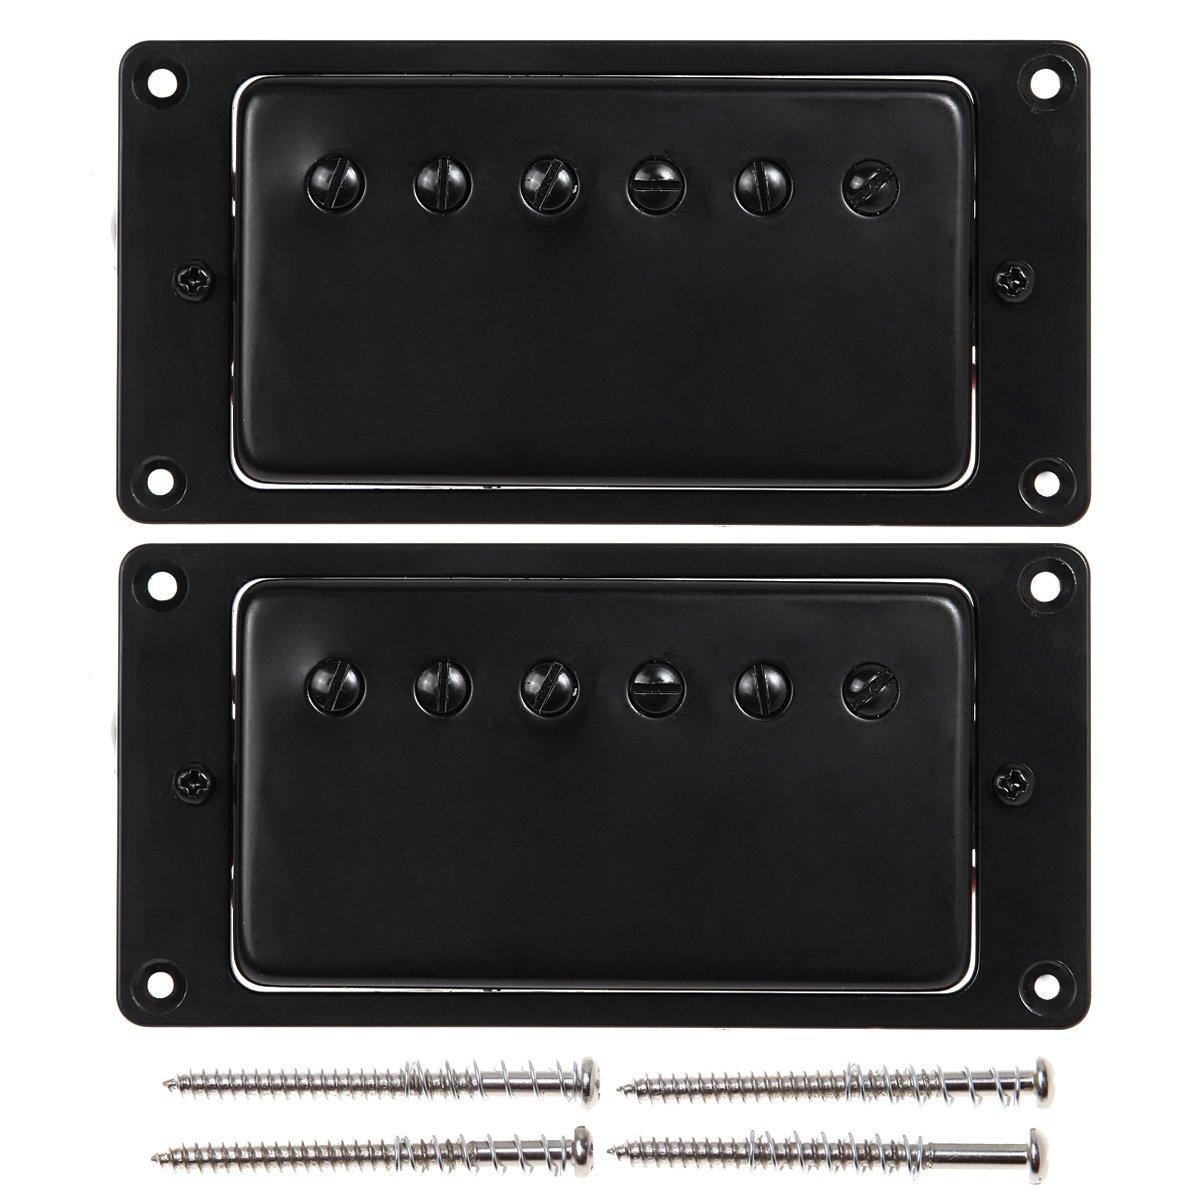 Kmise MI0338 Humbucker Pickup Set for Gibson Style Guitar Parts, Black